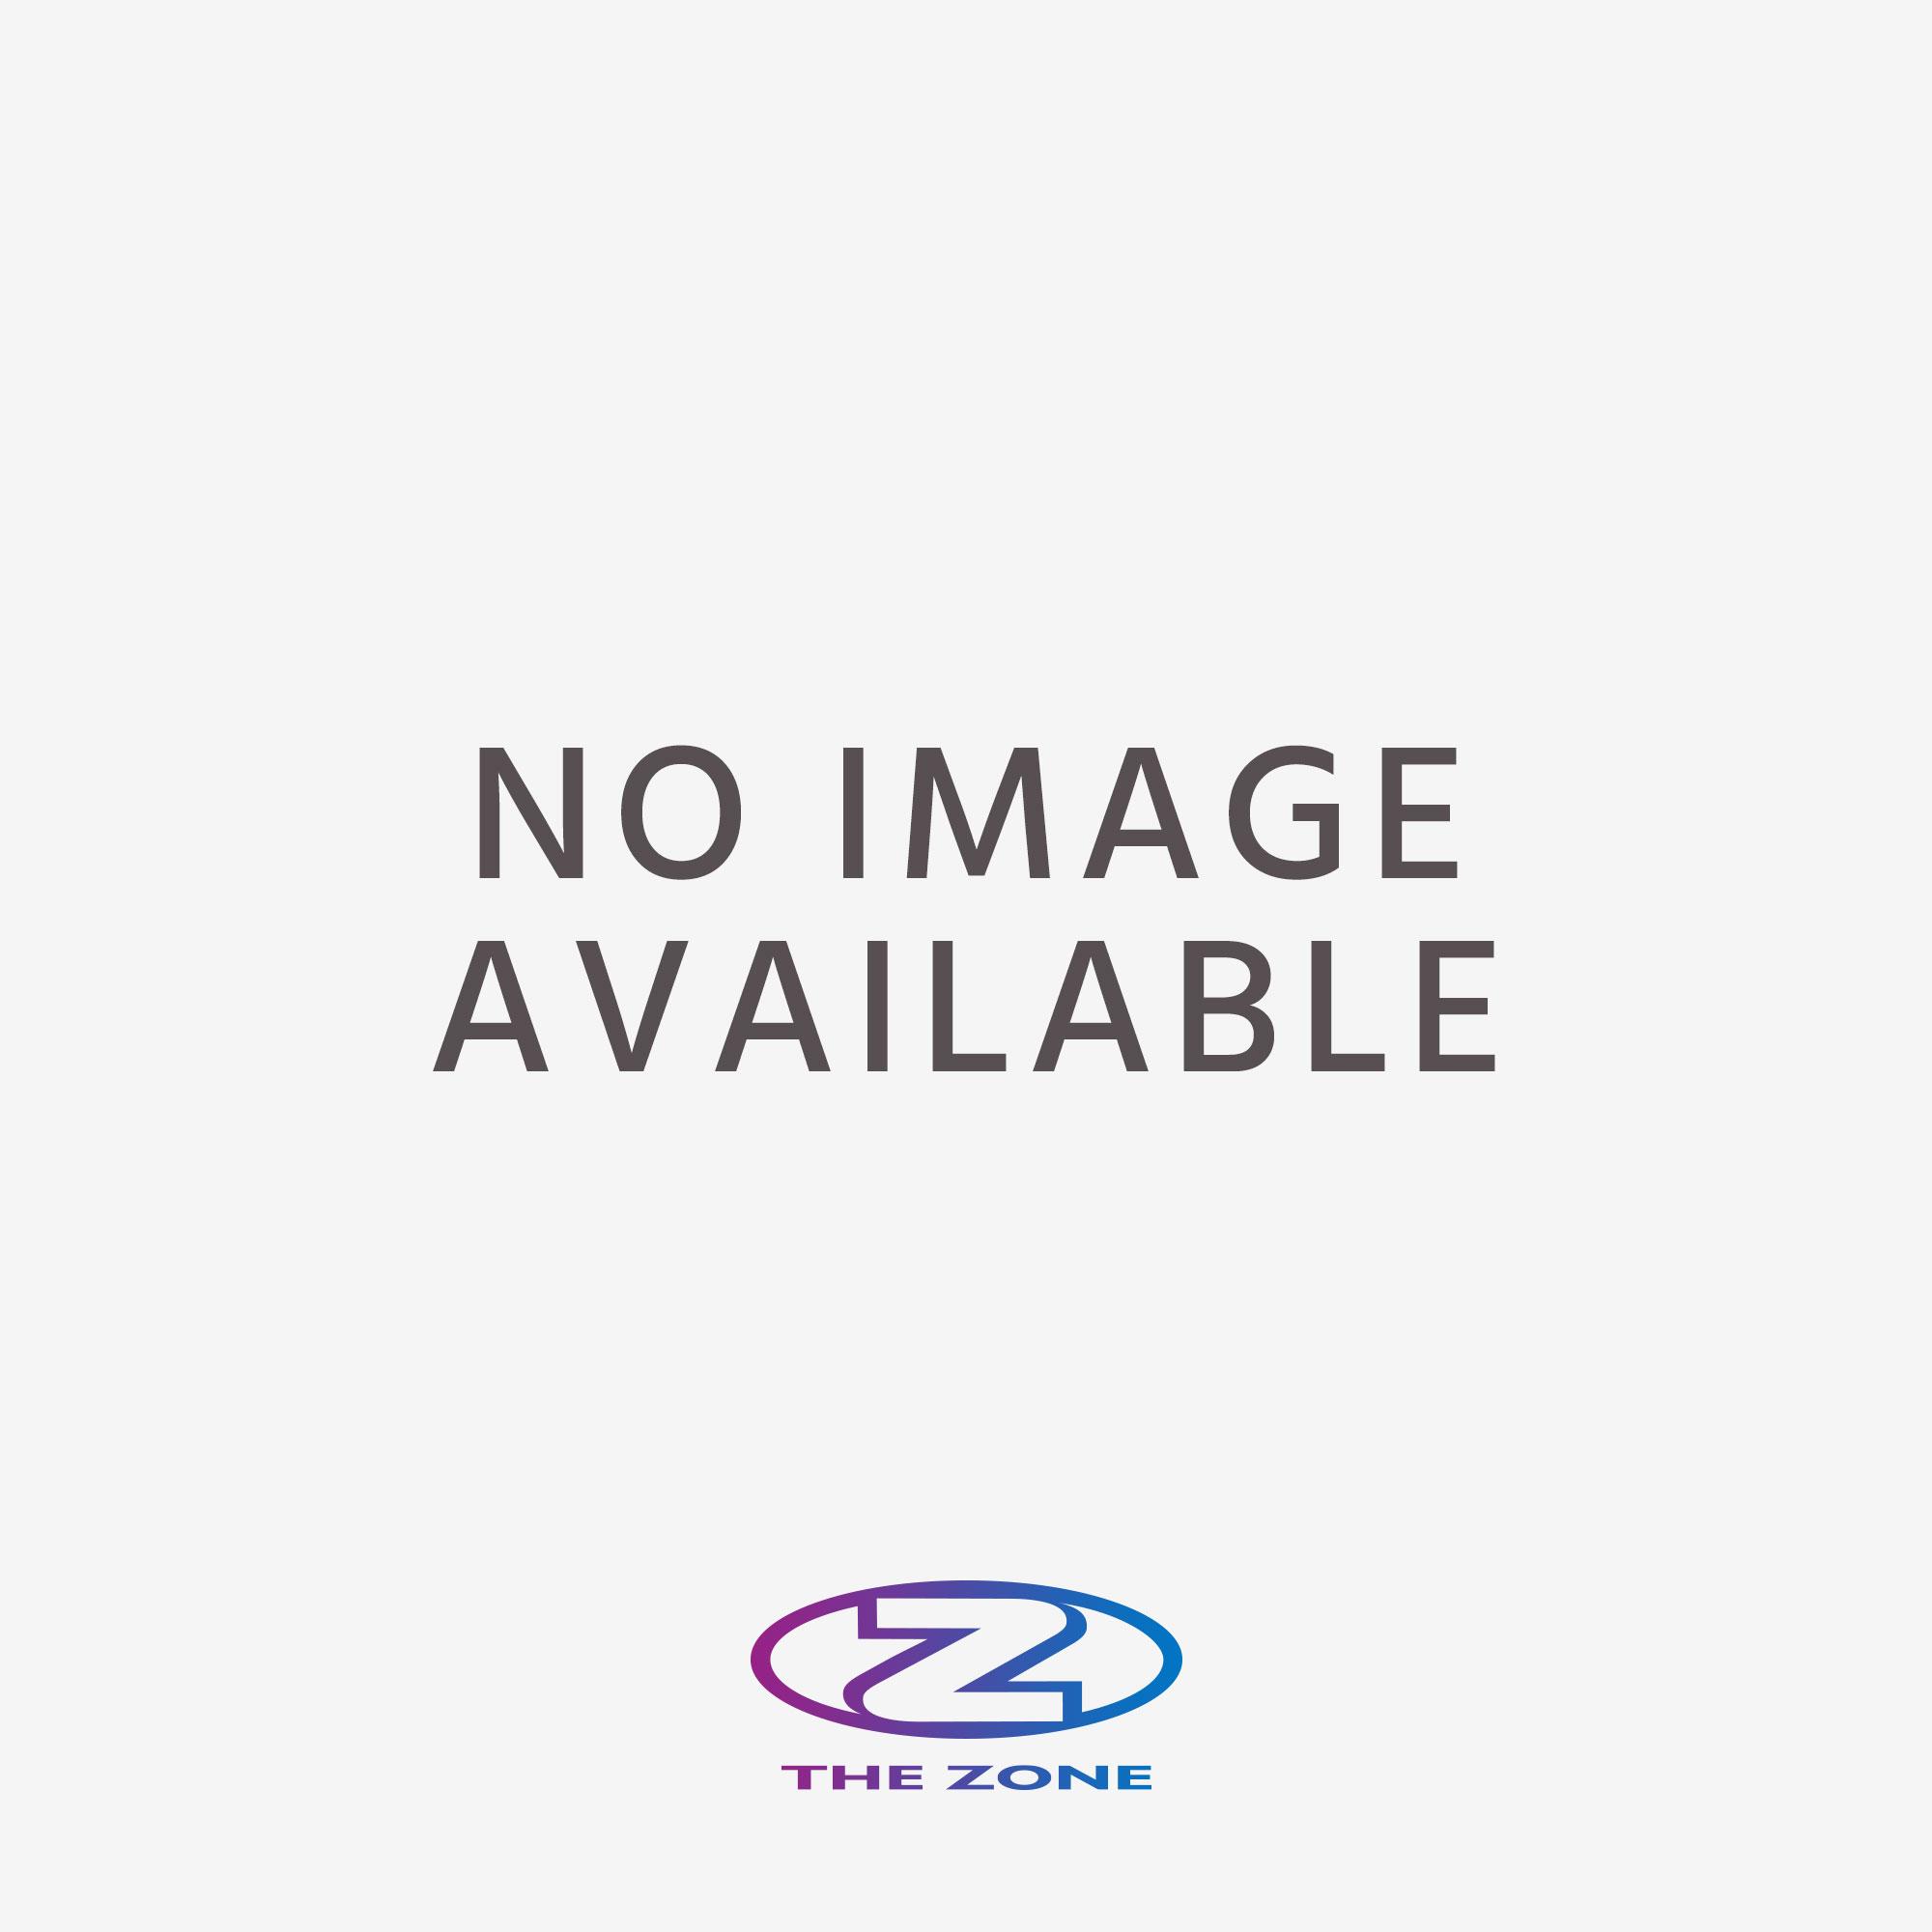 8a62f084ab Gymnastics Accessories - The Zone Gymnastics